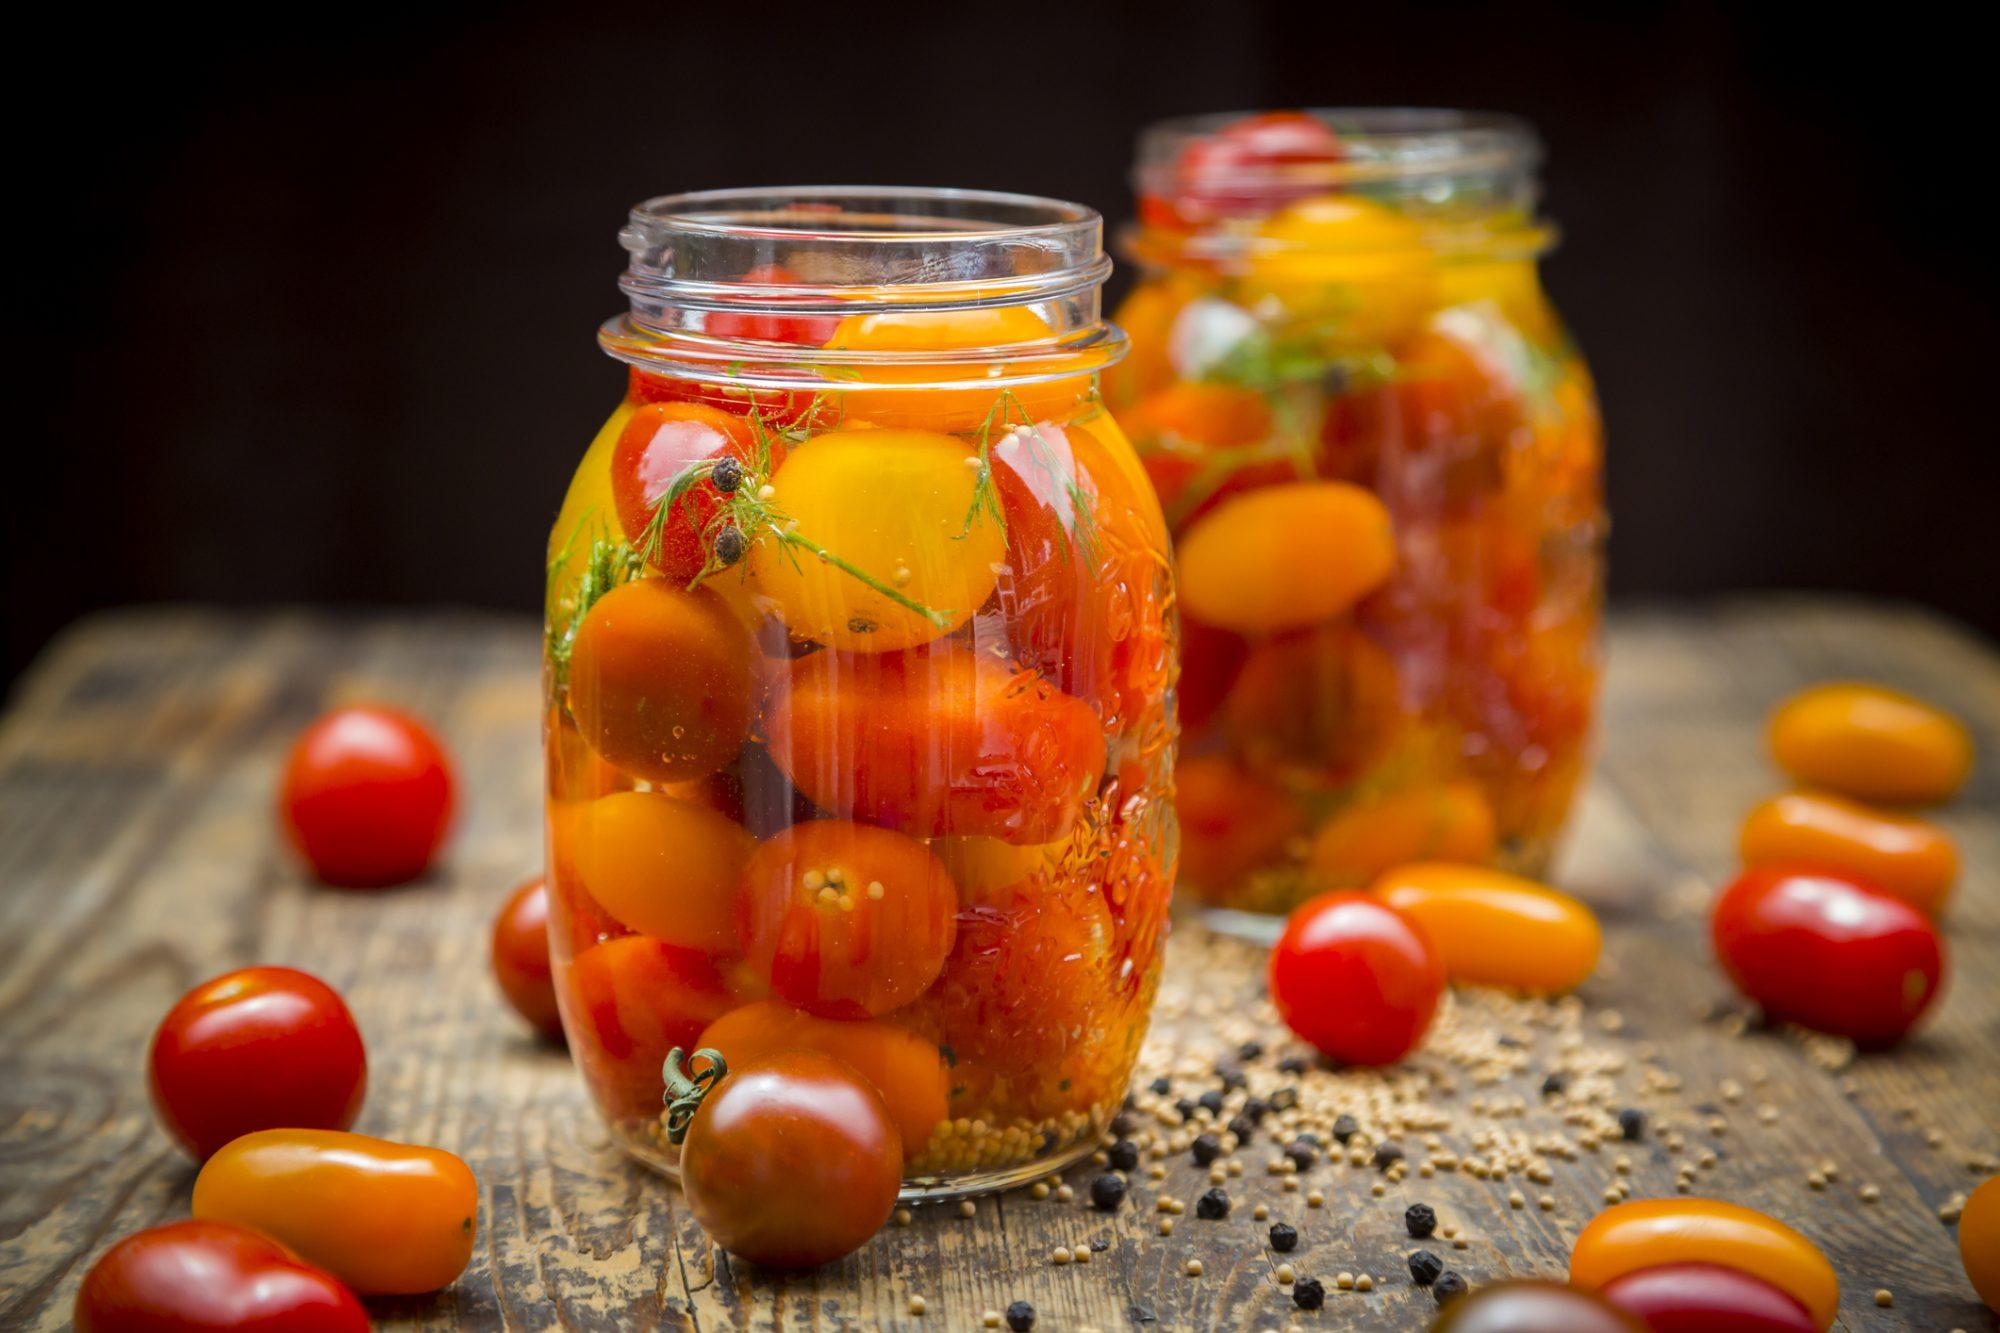 pickled tomatoes getty.jpg